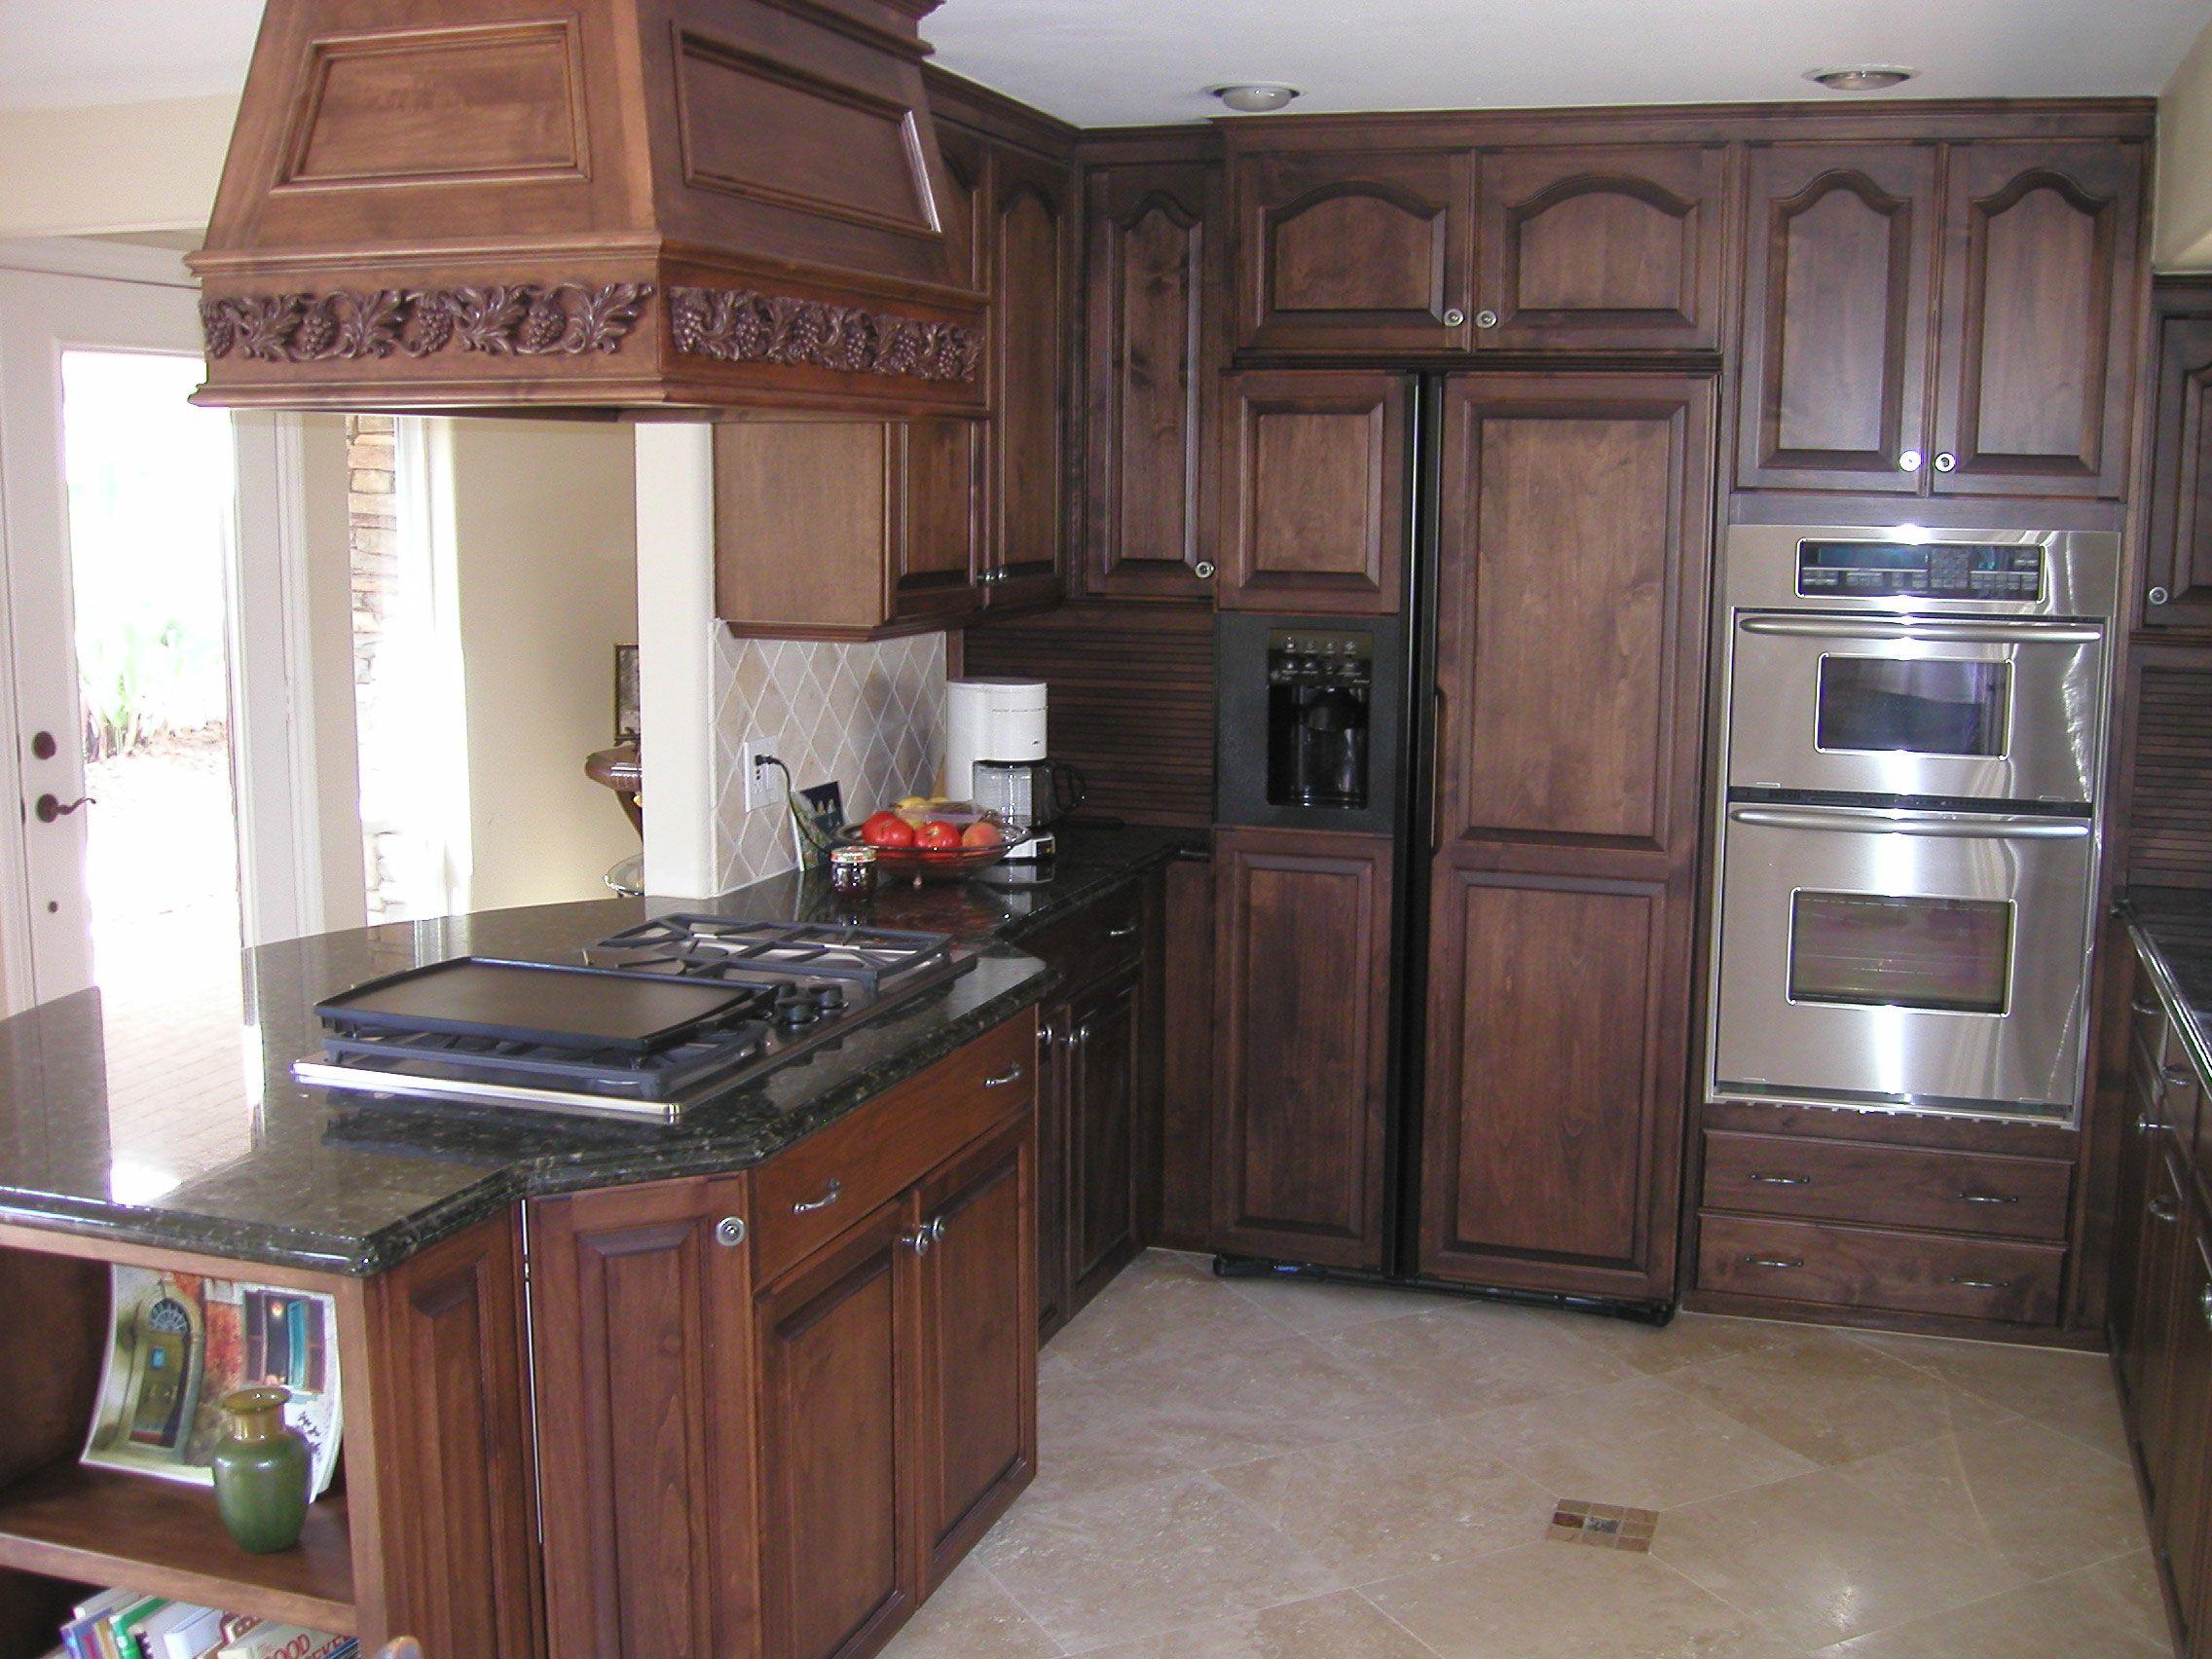 restaining kitchen cabinets a darker color restaining kitchen cabinets how to stain oak cabinets kitchen cabinets Stained dark oak and